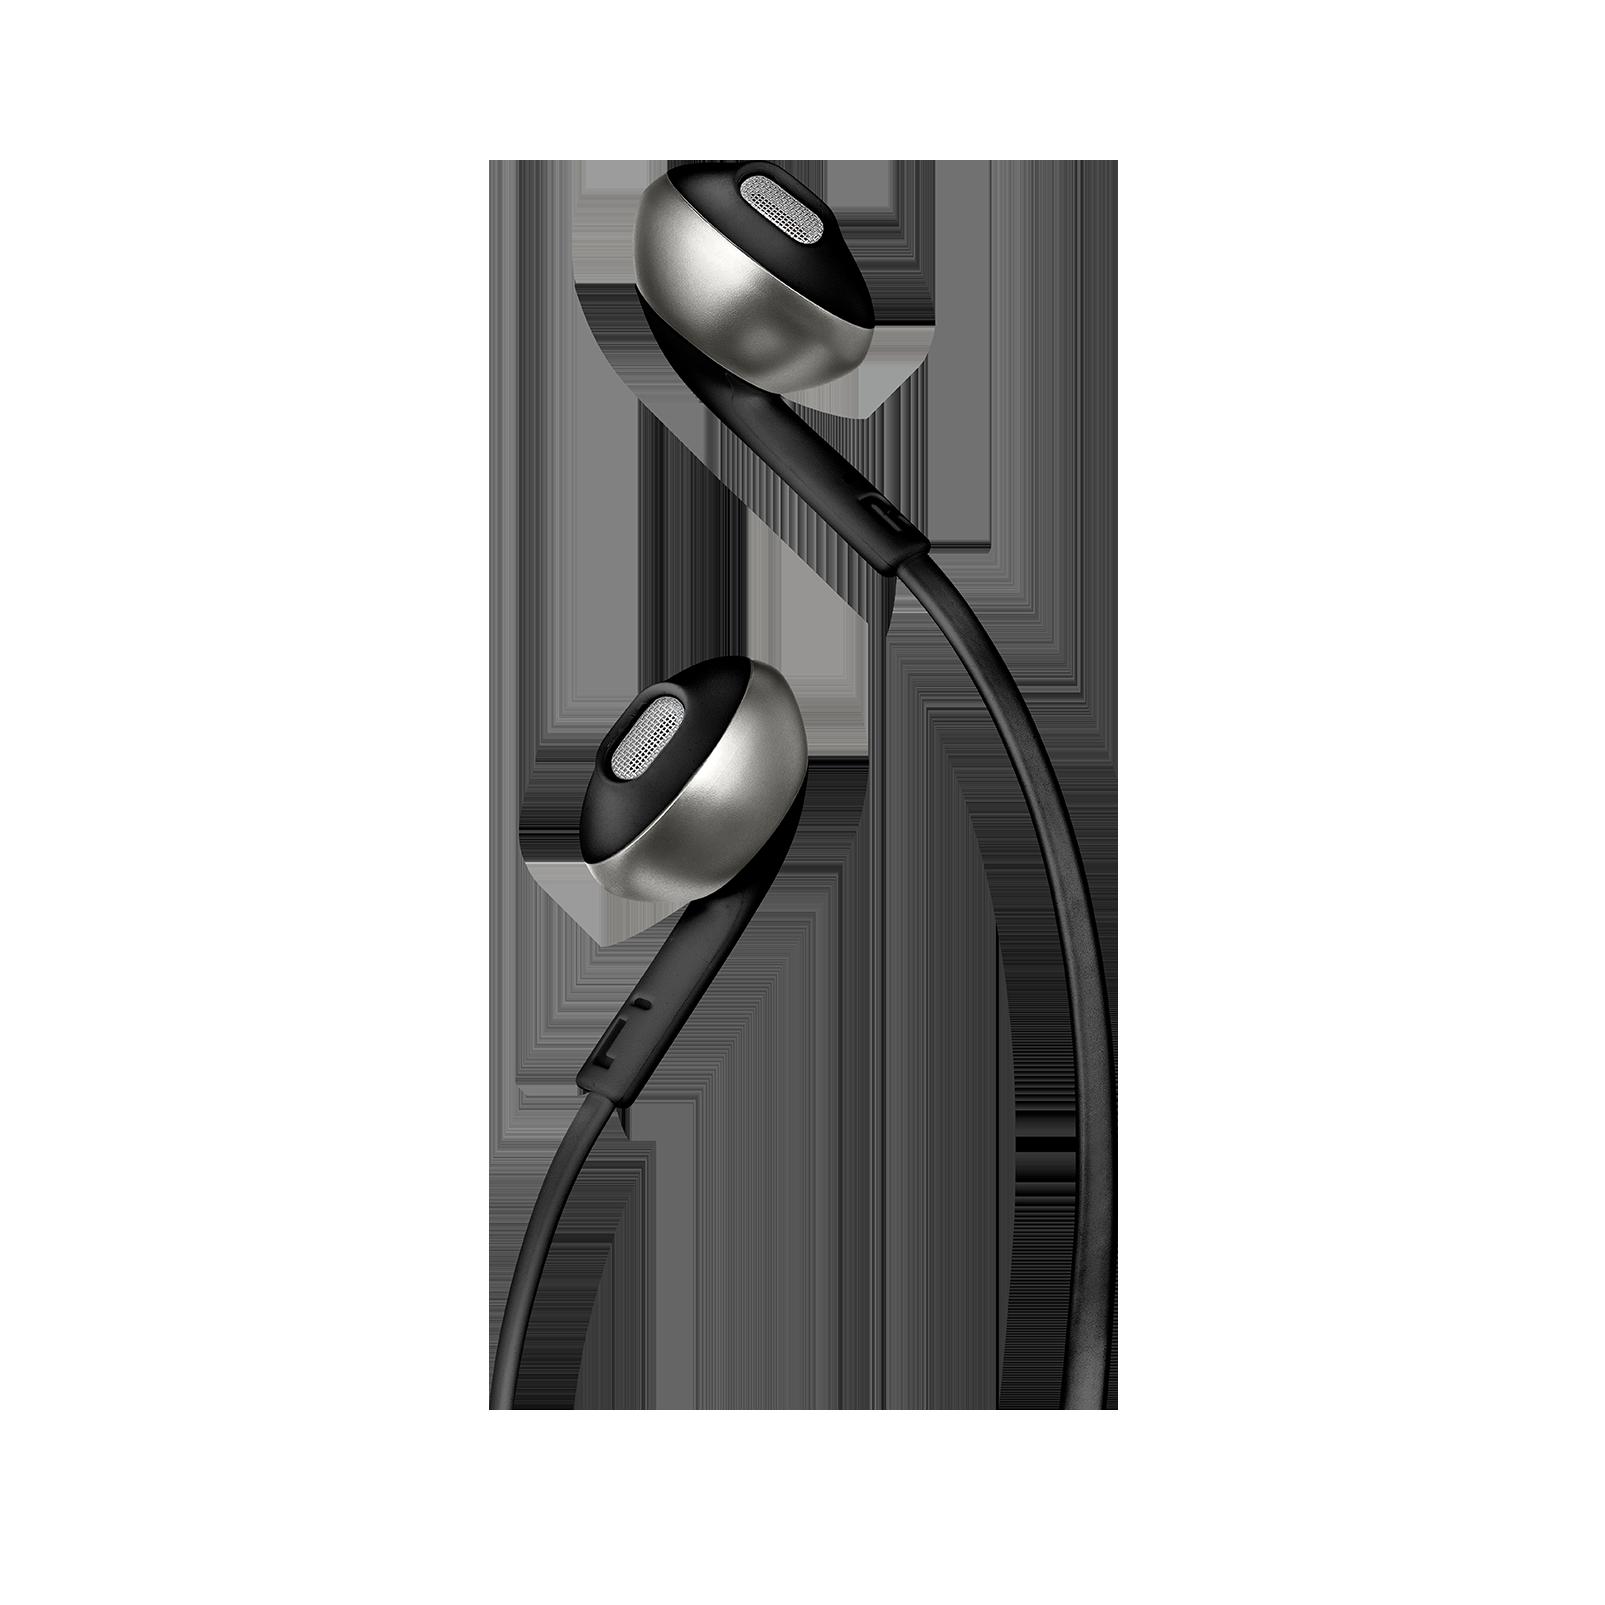 bf3184b8229 JBL TUNE 205BT | Wireless Earbud headphones